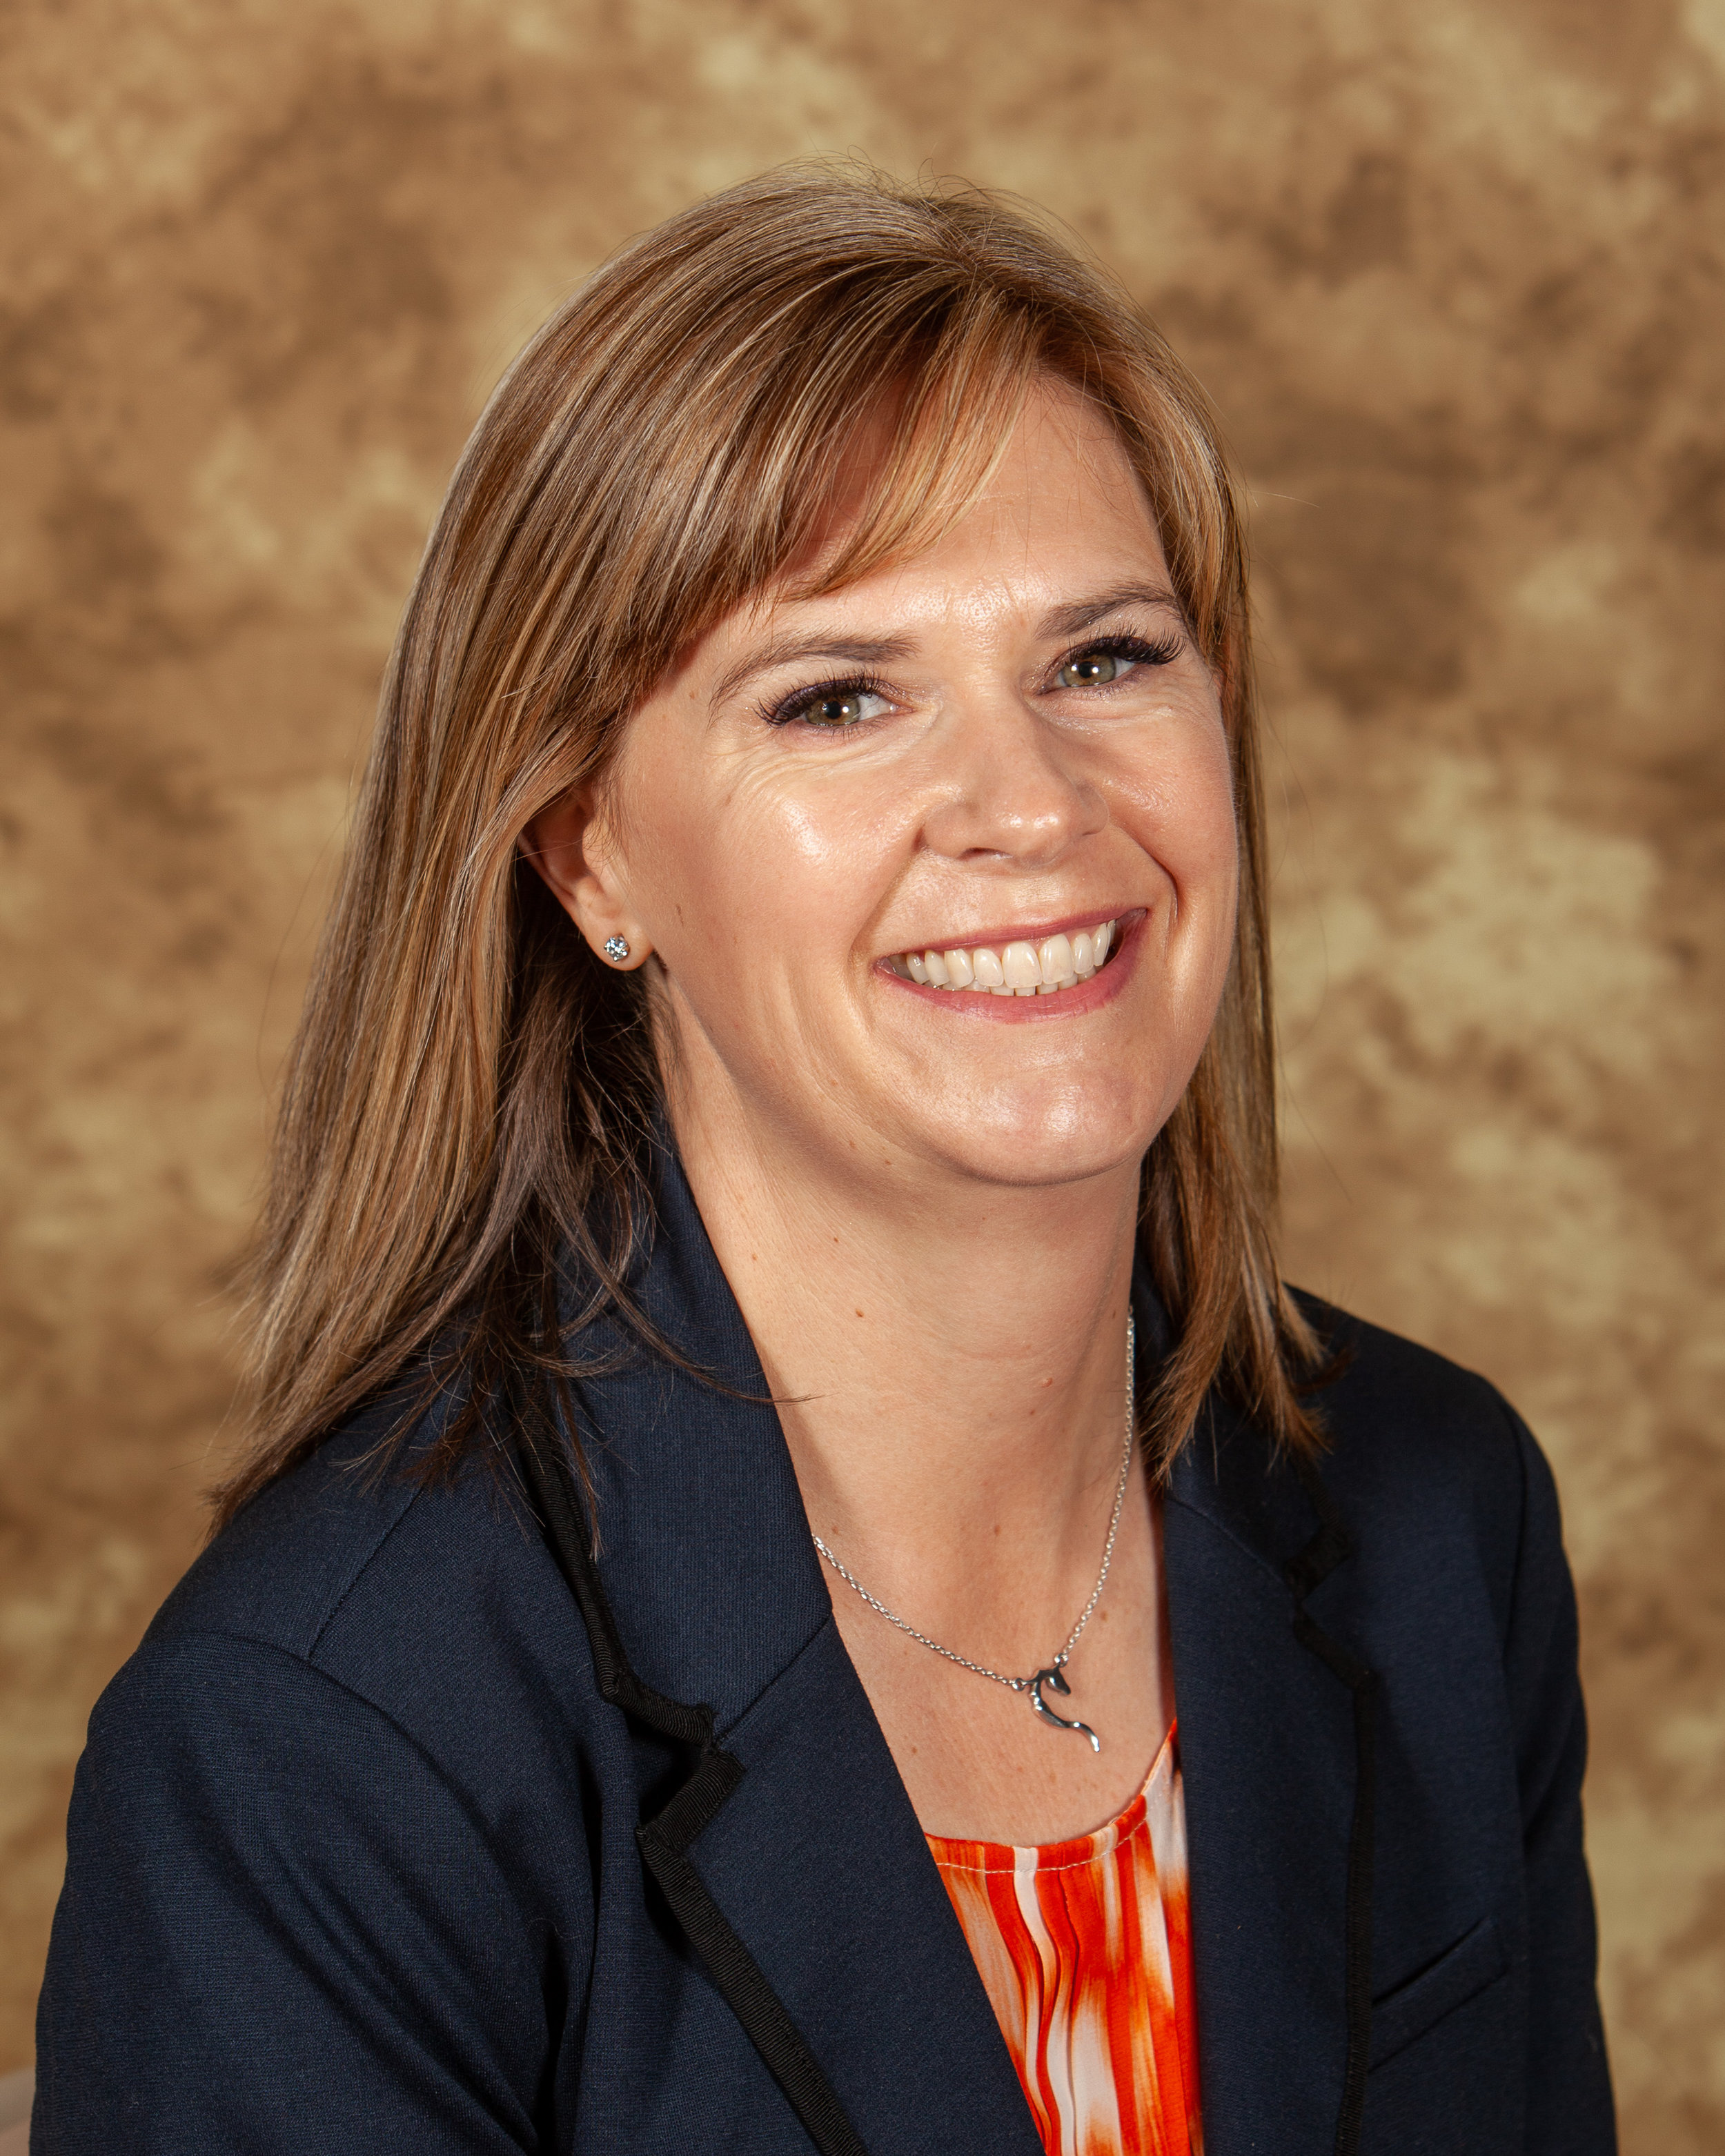 Jeanne Pickens